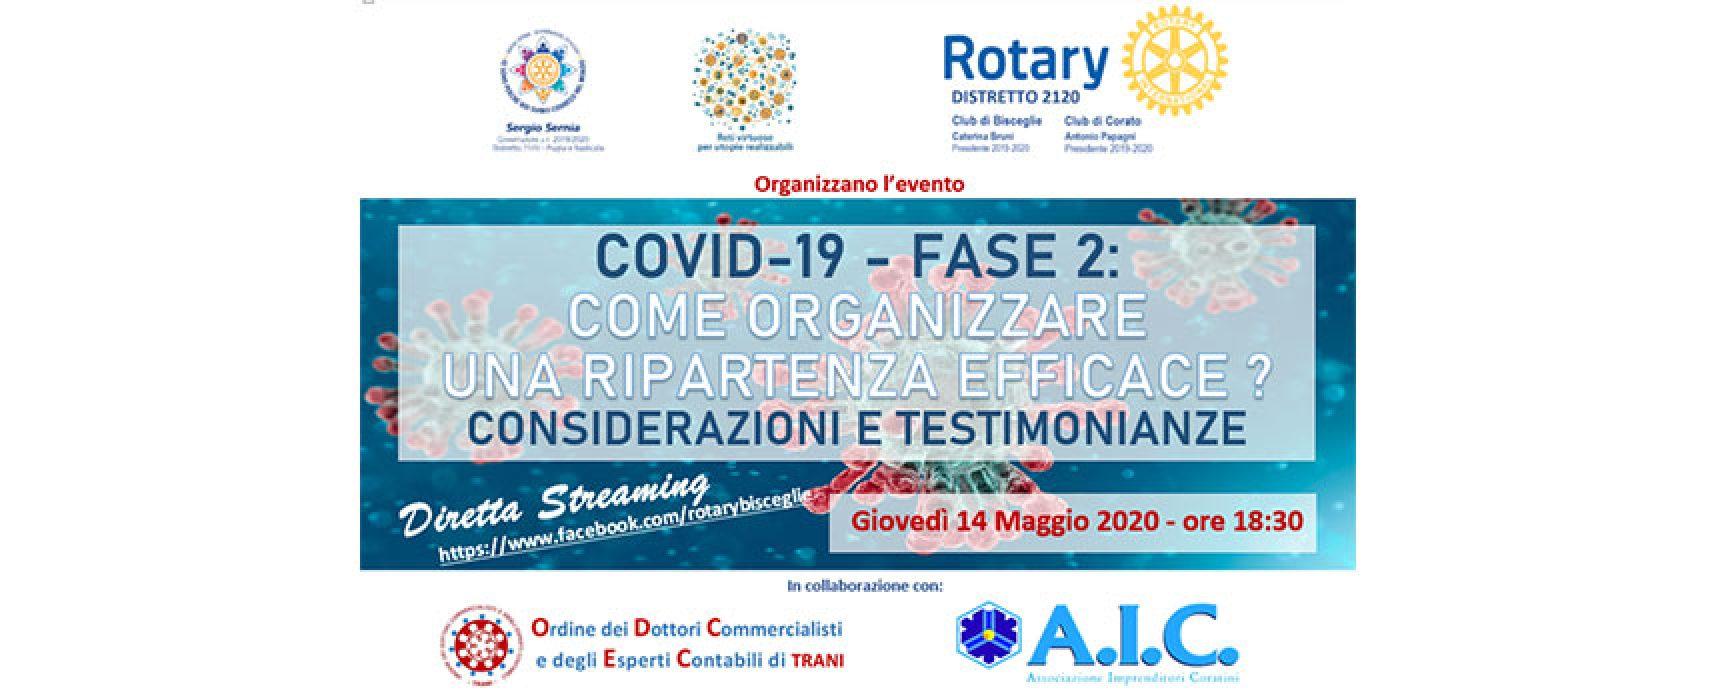 Rotary Club Bisceglie organizza diretta Facebook su ripartenza efficace dopo emergenza sanitaria